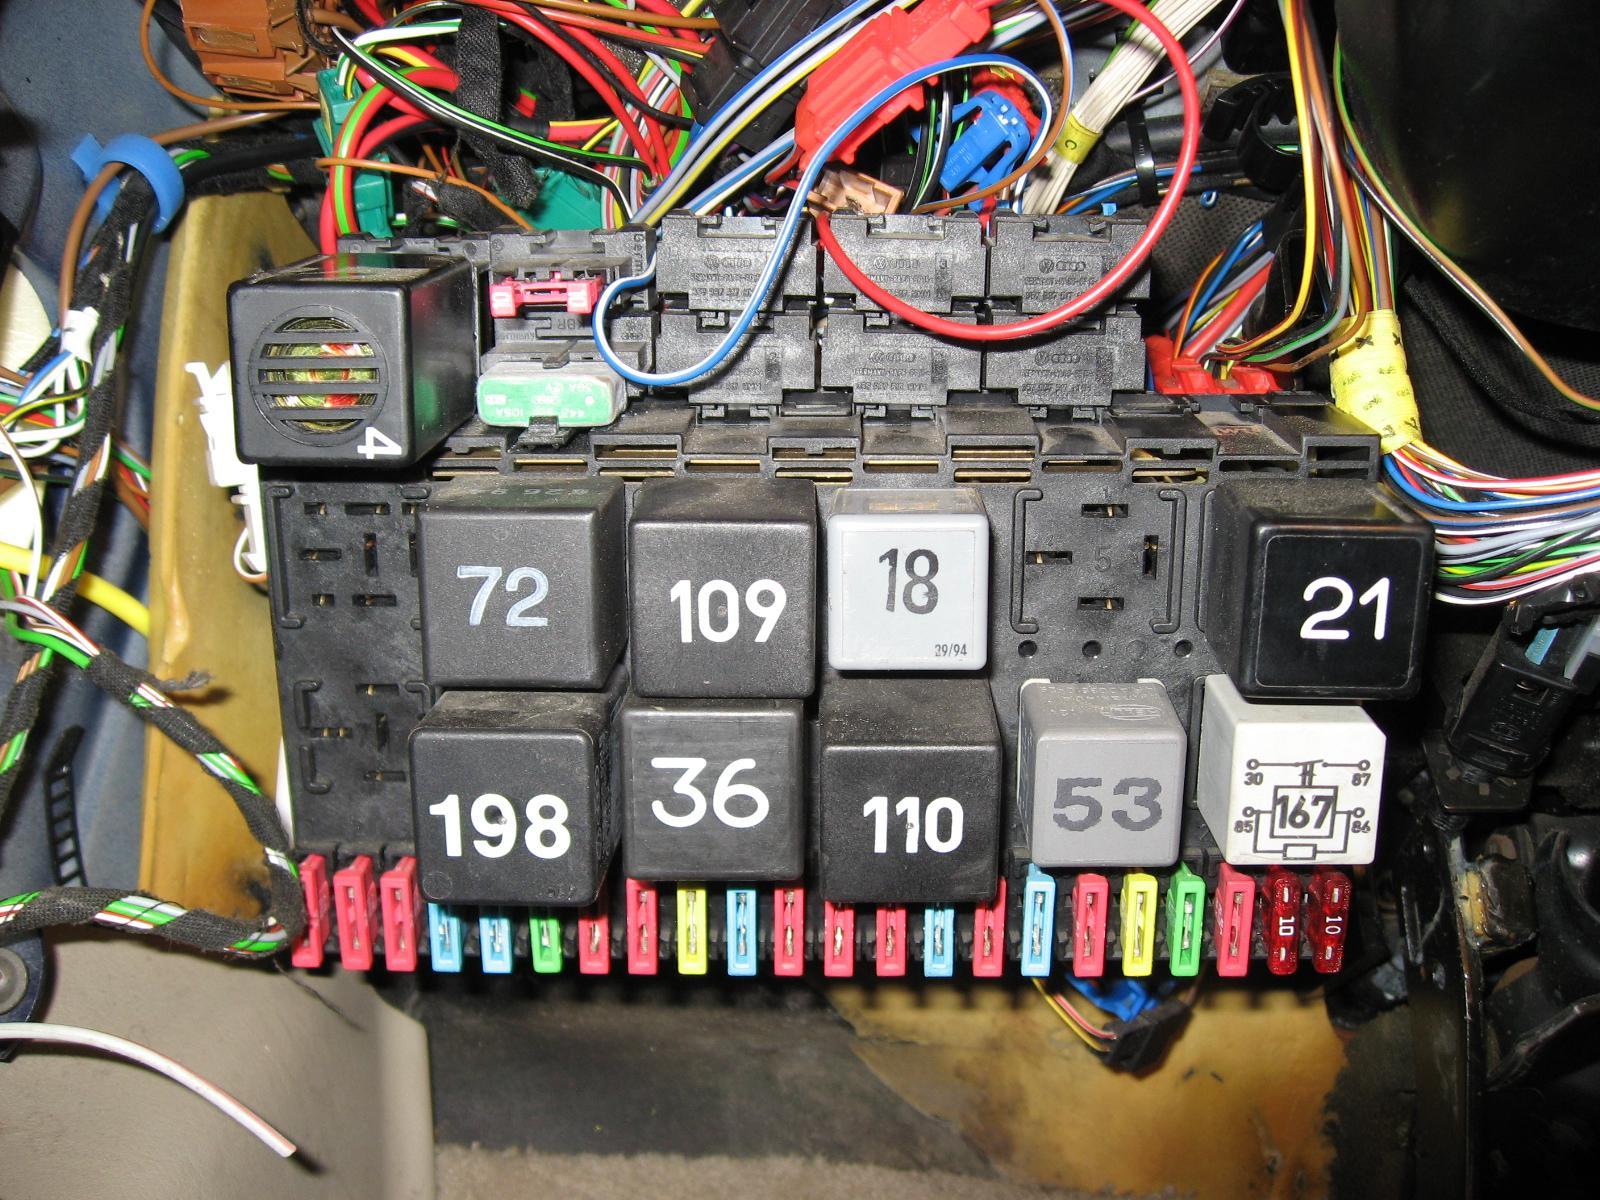 vwvortex com p5 passat into a 98 golf wireing problem volkswagen passat fuse box location